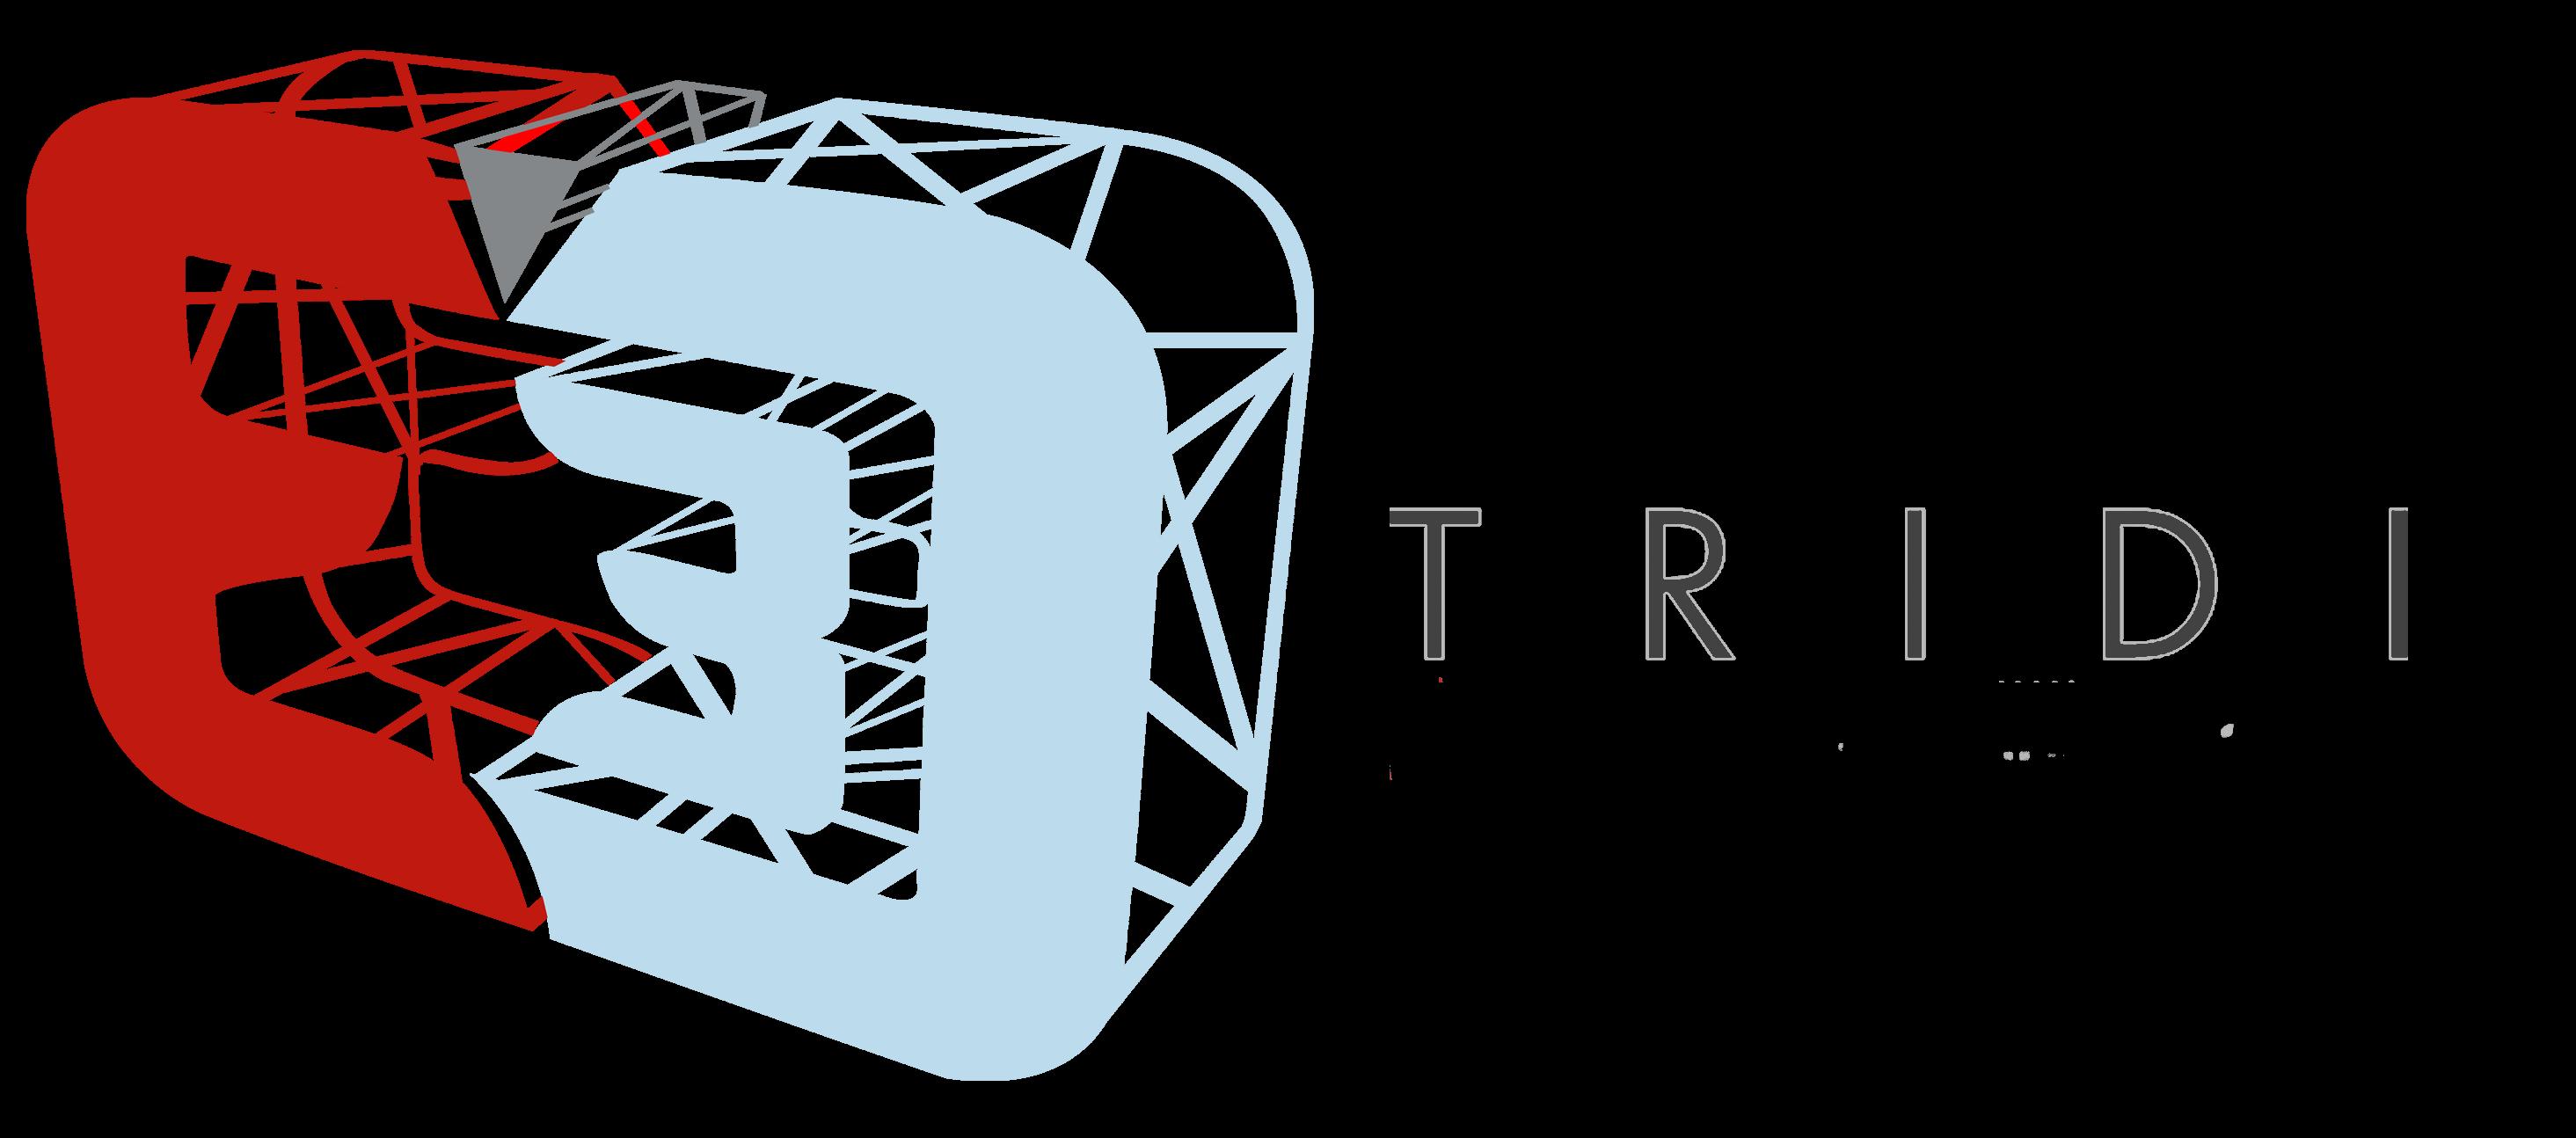 TridiMX